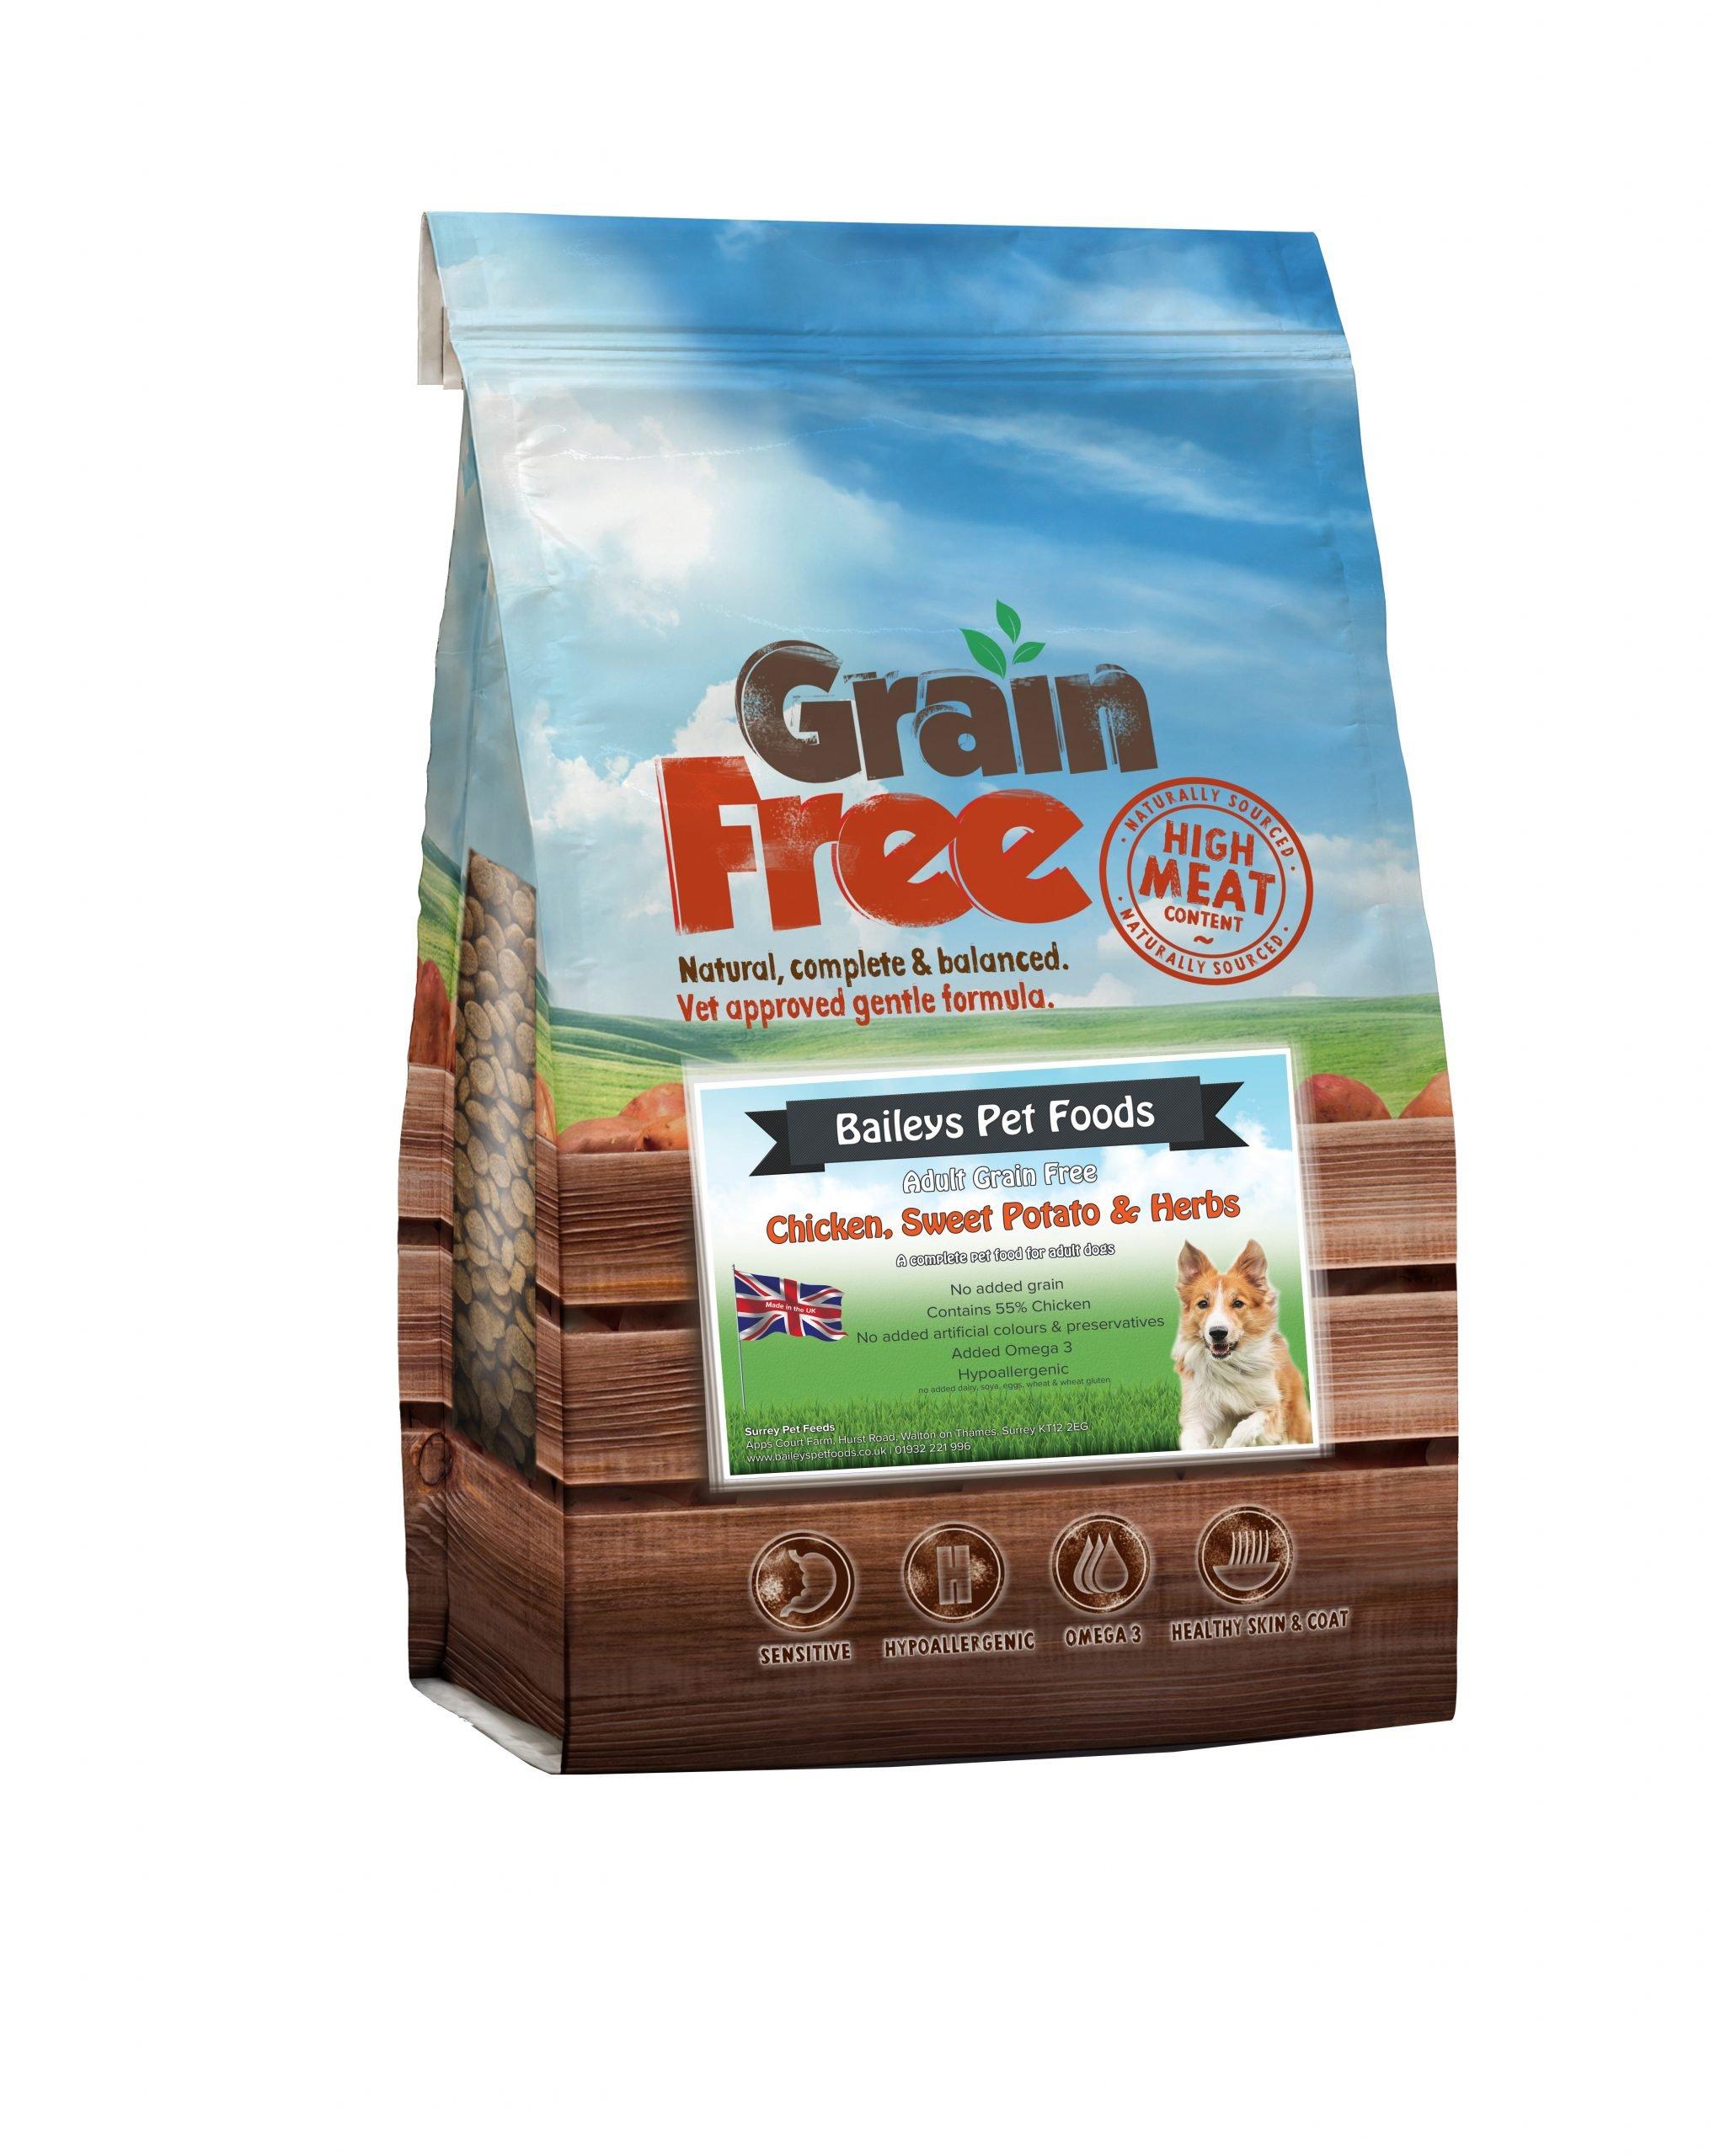 Baileys Pet Foods - Chicken Sweet Potato and Herbs - Bag Images